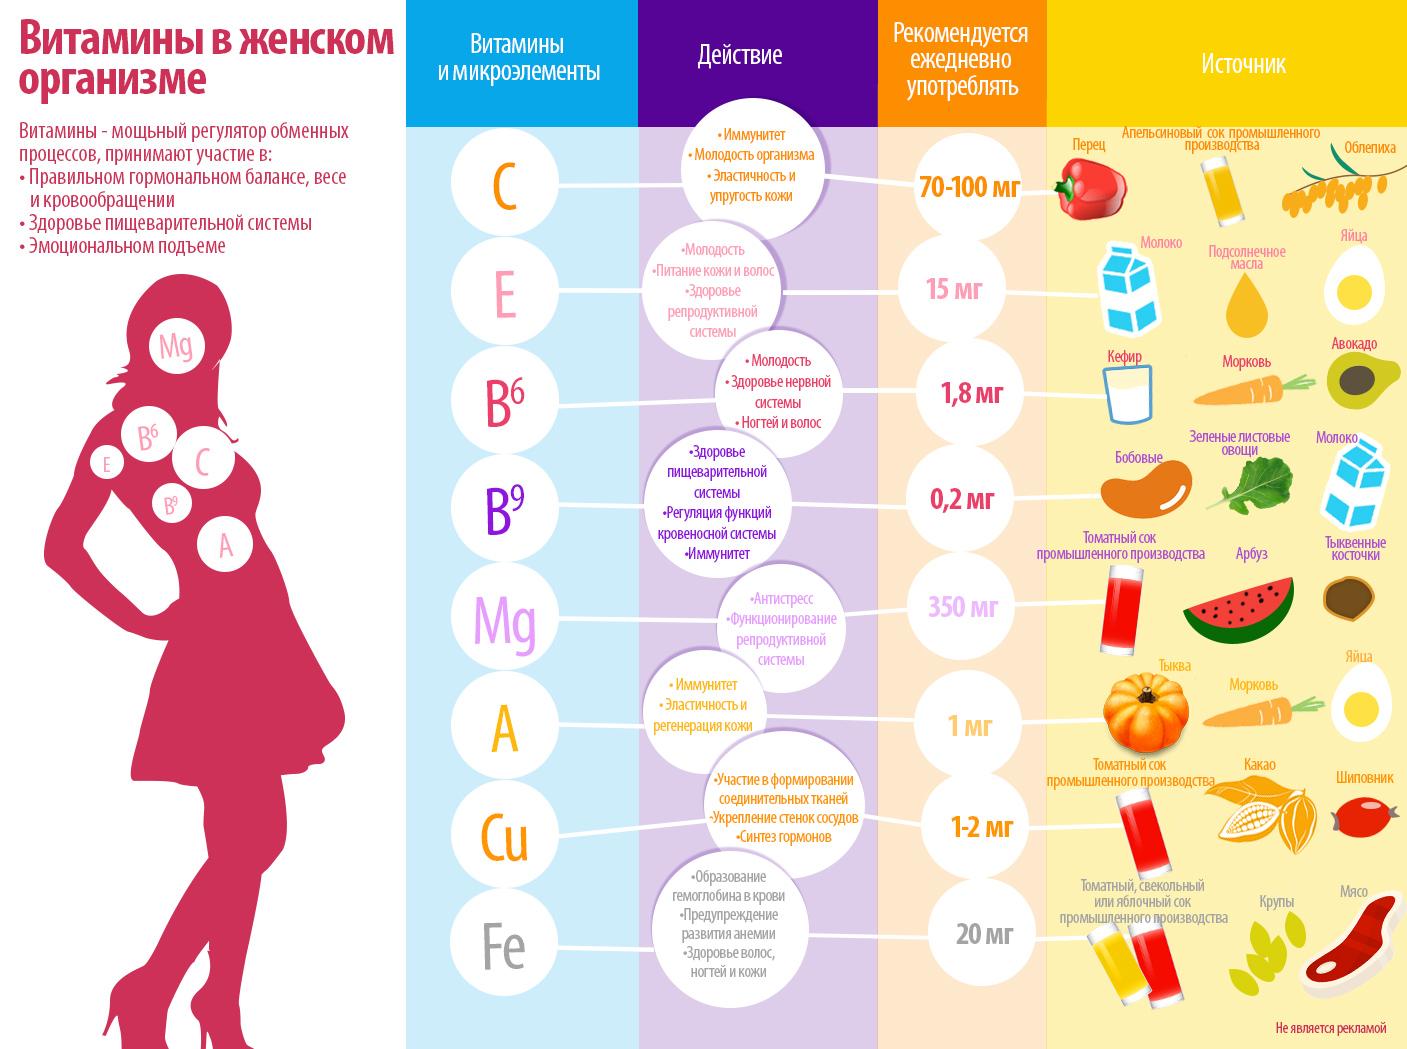 infographic-vitamins